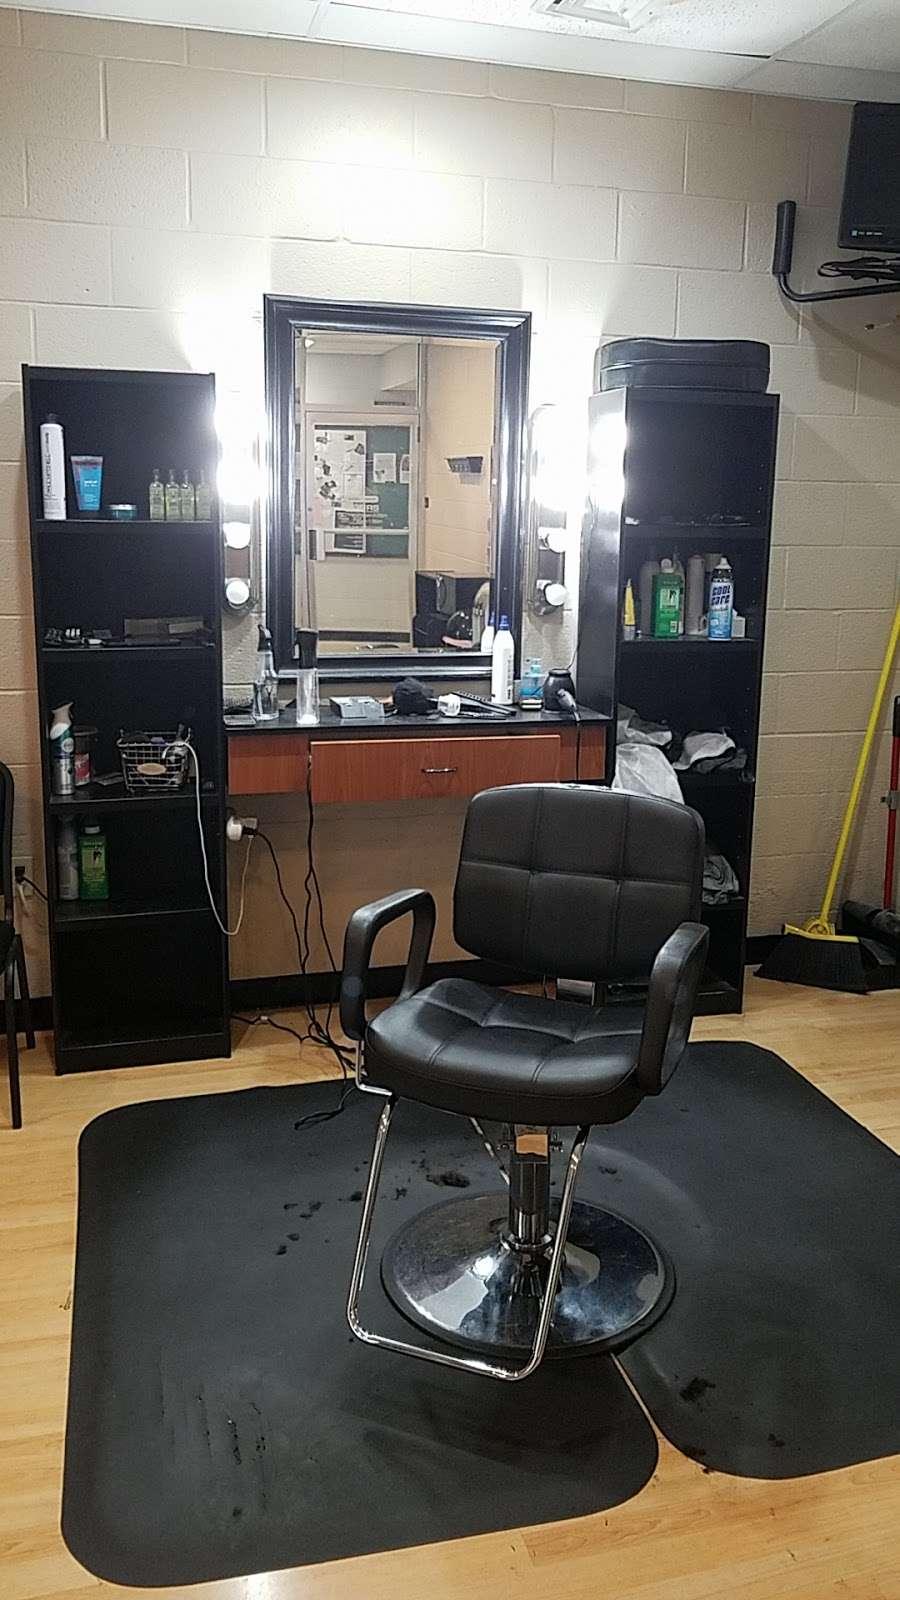 Emilios Barber Shop - hair care  | Photo 3 of 4 | Address: 2880 Carol Rd, East York, PA 17402, USA | Phone: (717) 968-8239